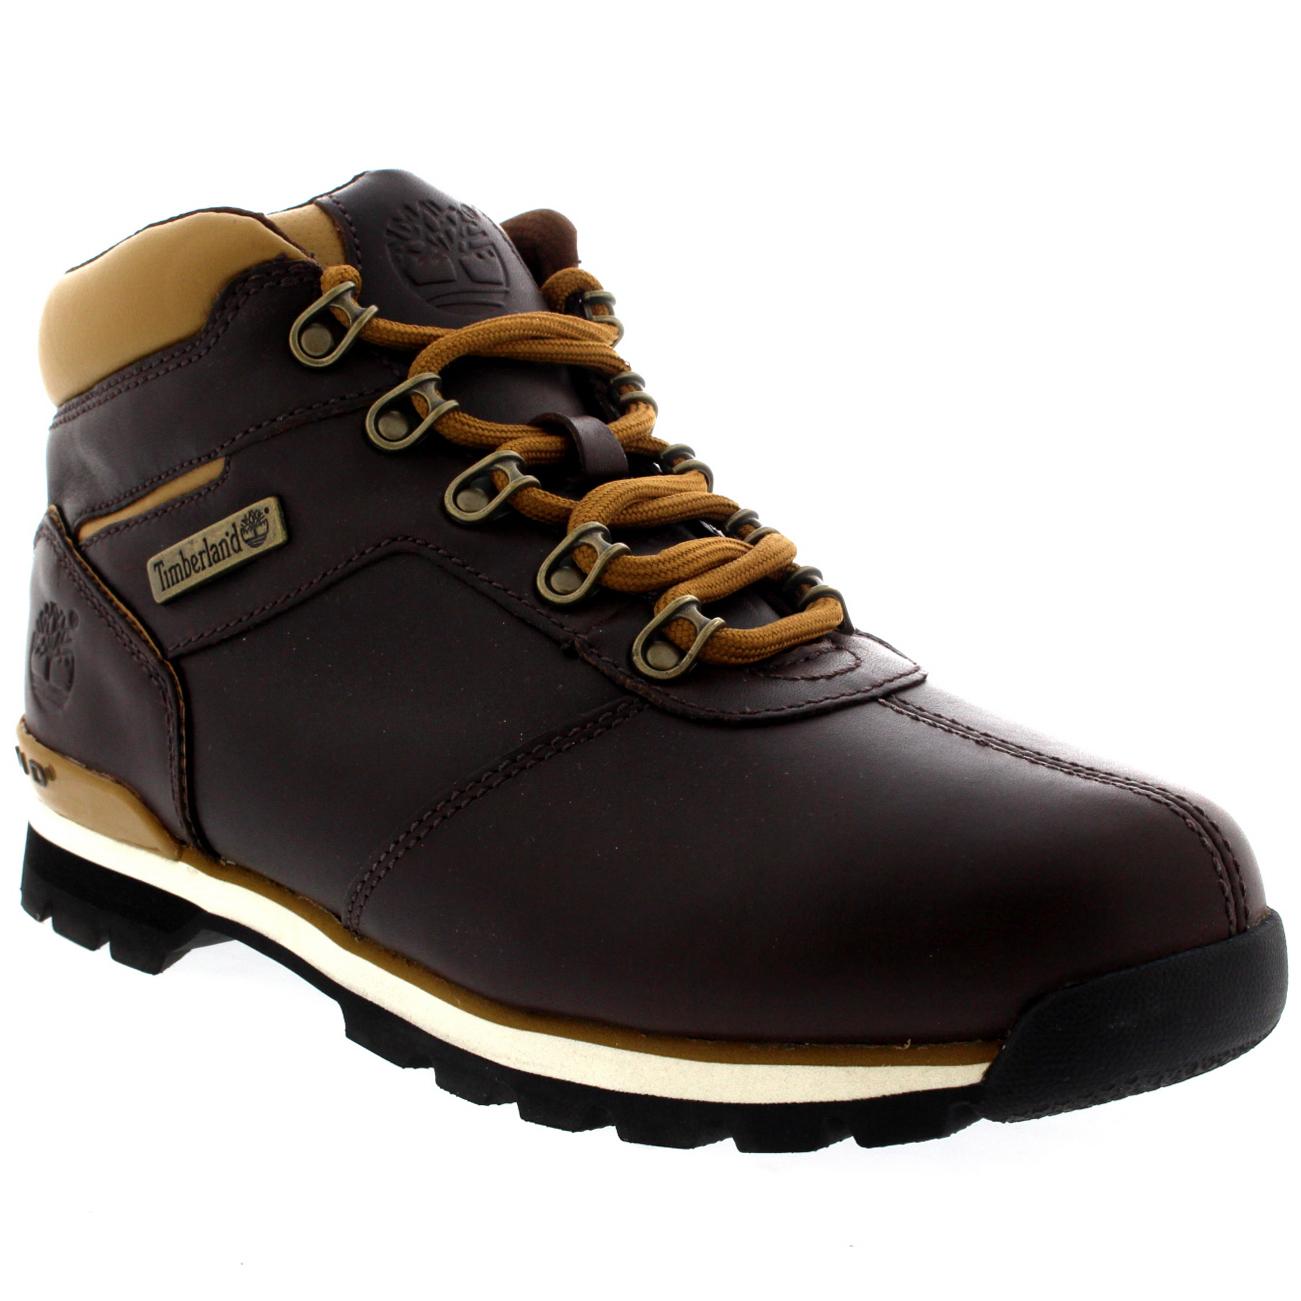 timberland mens splitrock 2 hiker boots navy blue